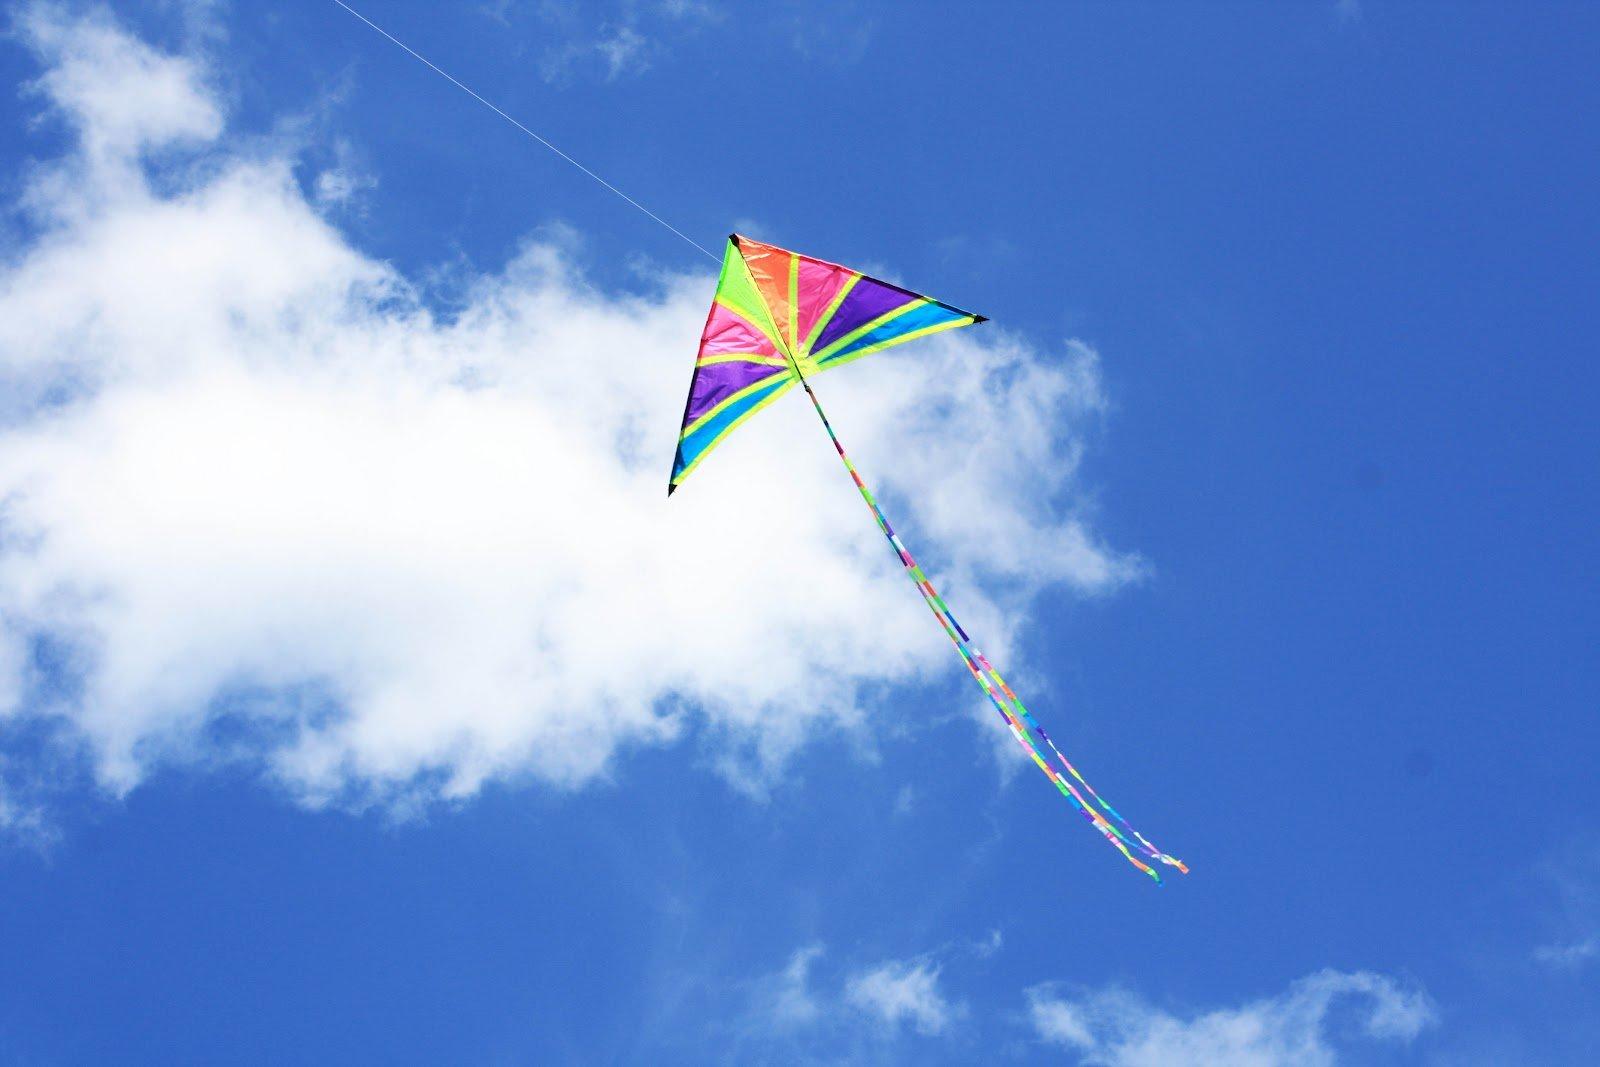 Kite flying bokeh flight fly summer hobby sport sky toy fun 1600x1067